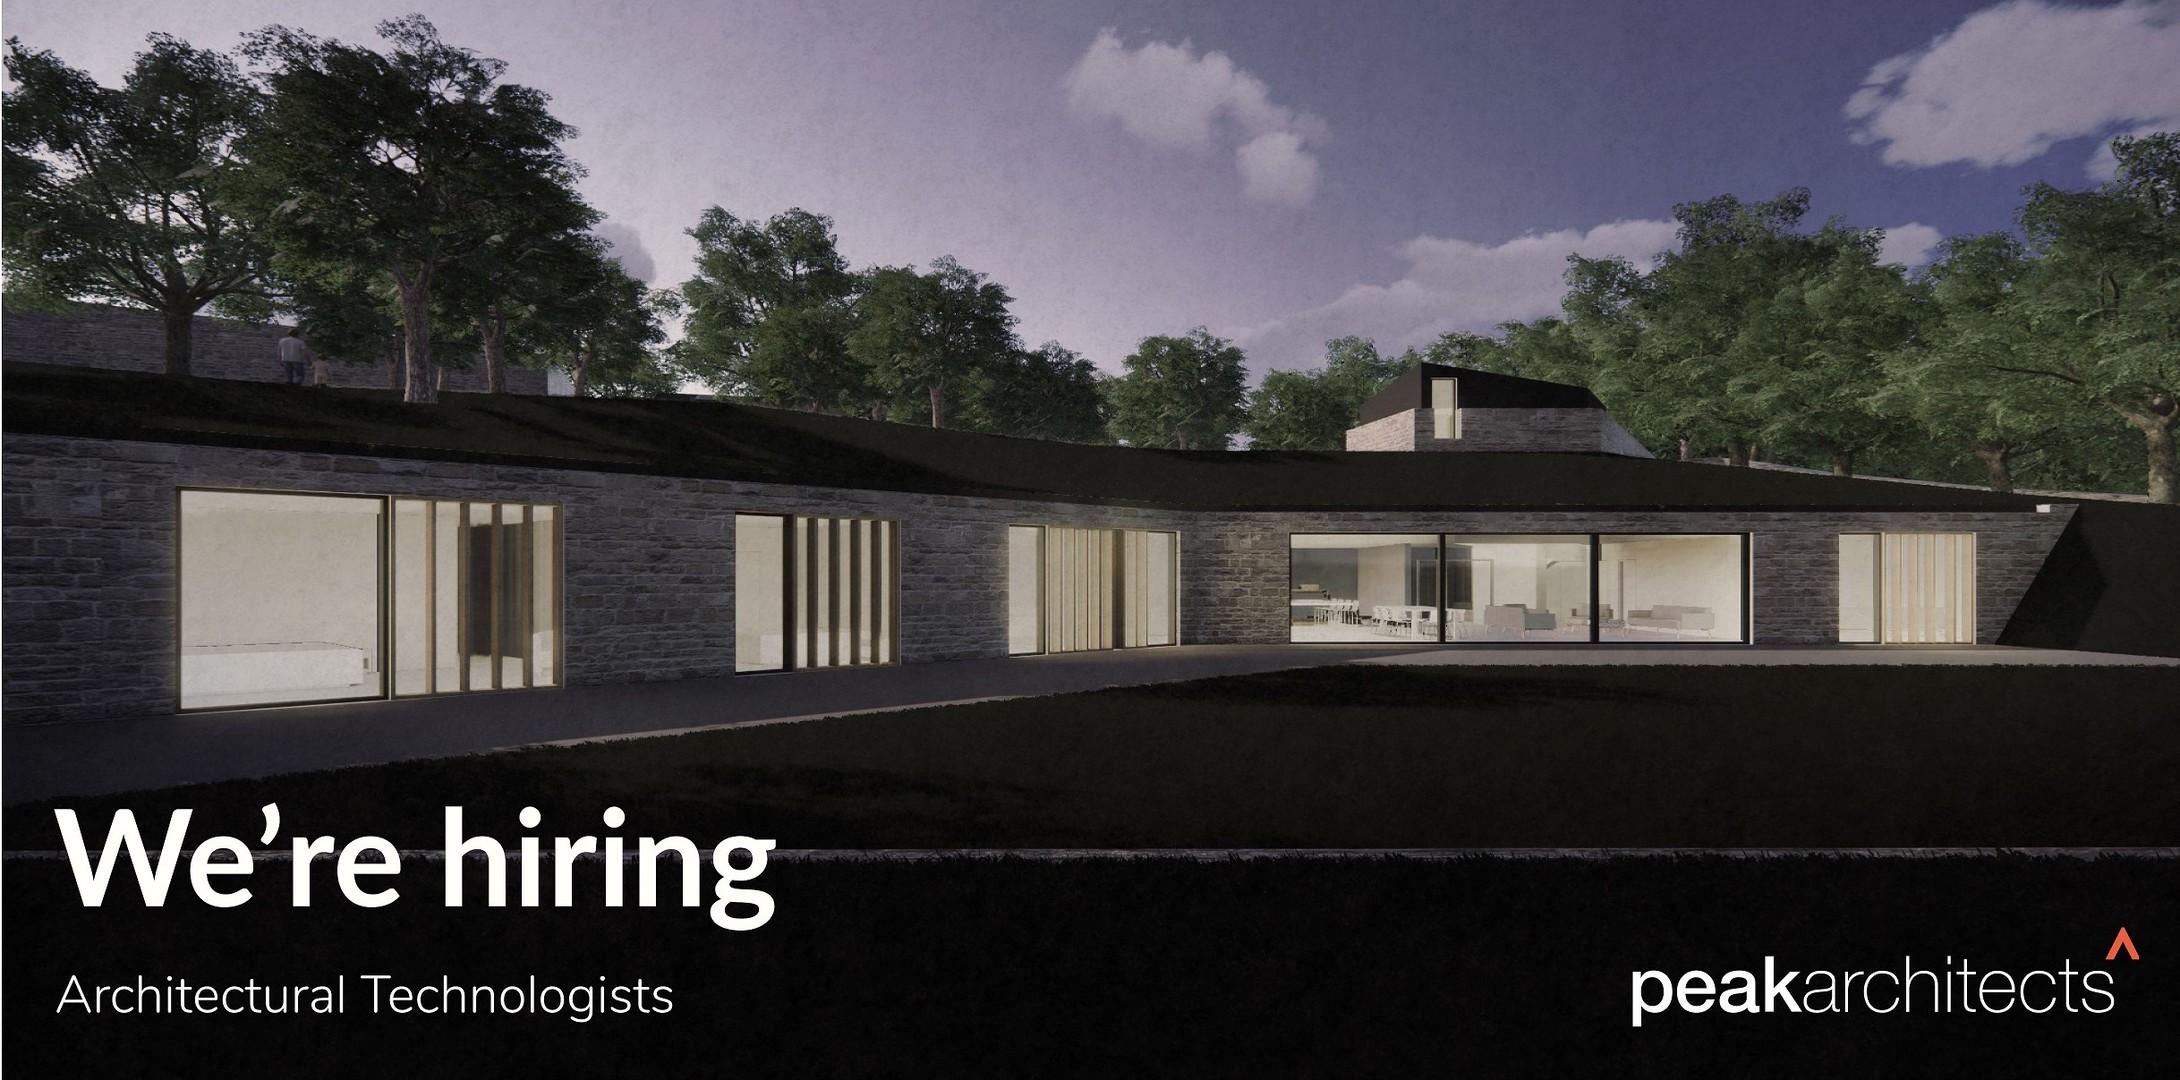 Job advert architectural technologists